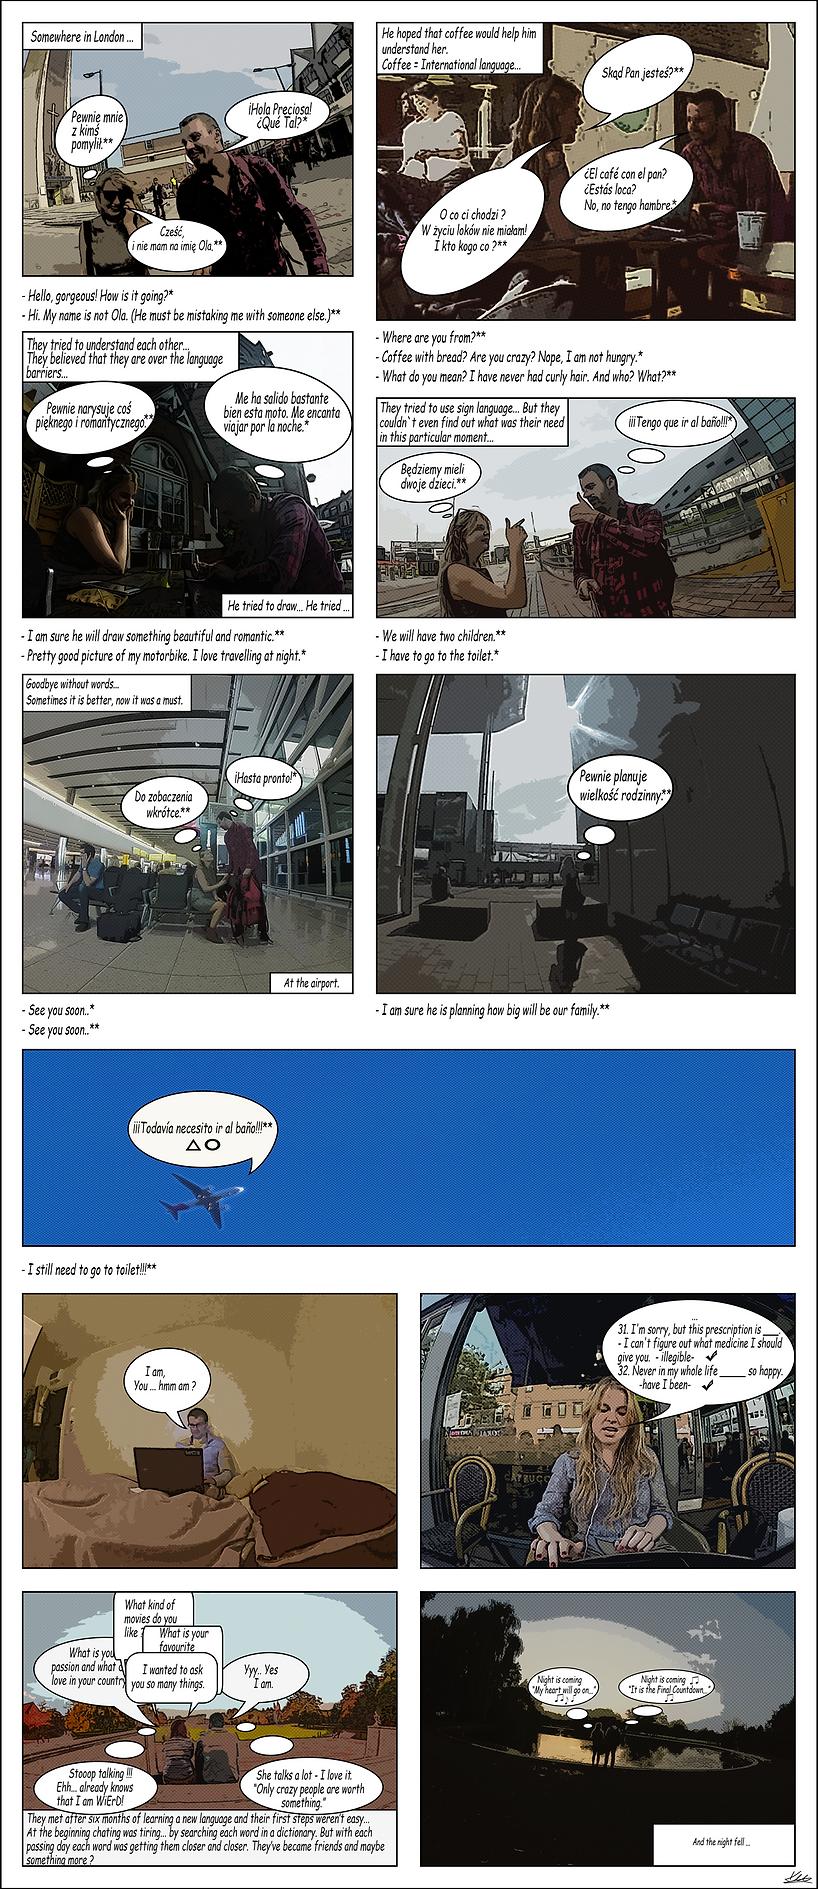 10 Komiks rewizja 1.05.png